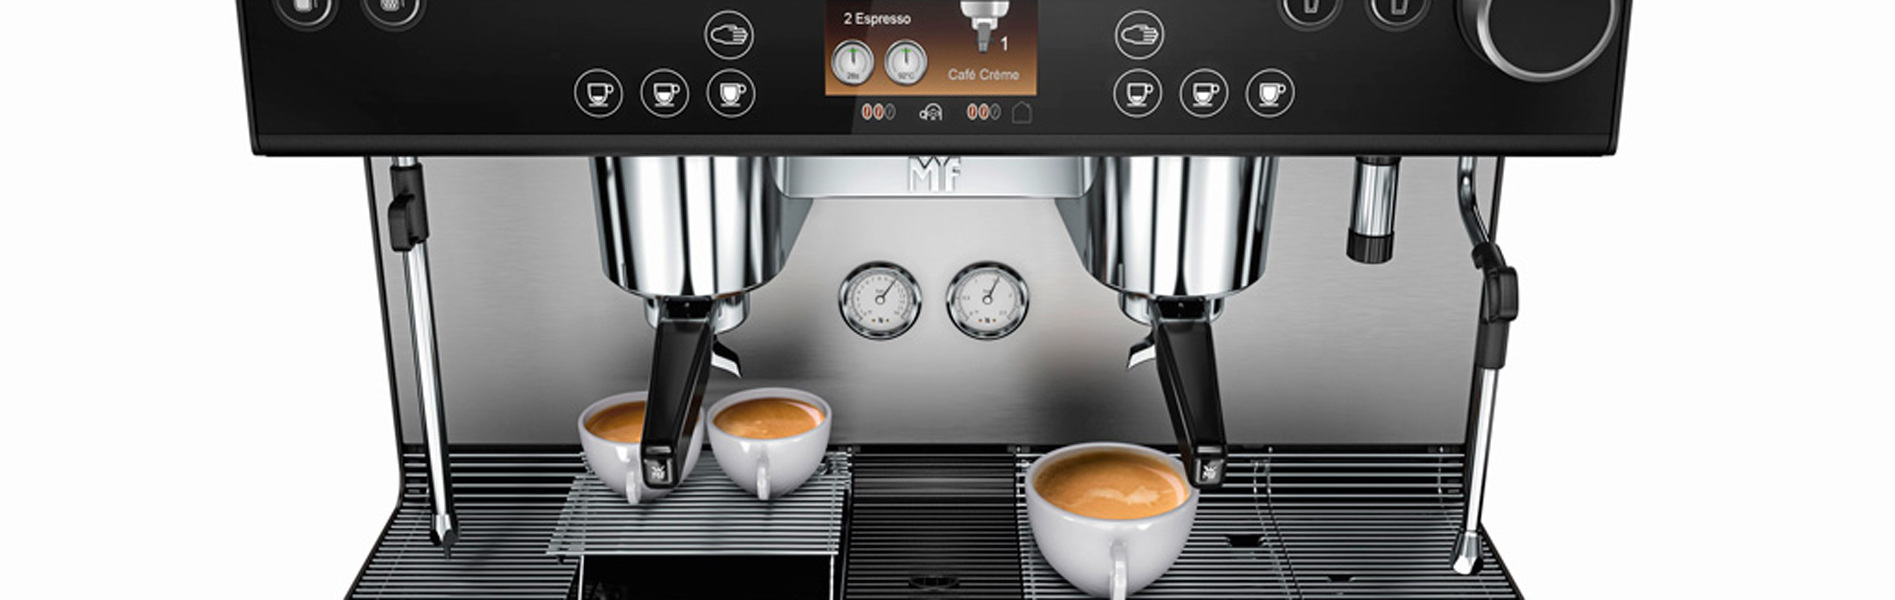 WMF-Espresso-Kaffeemaschine Unikorn Catering